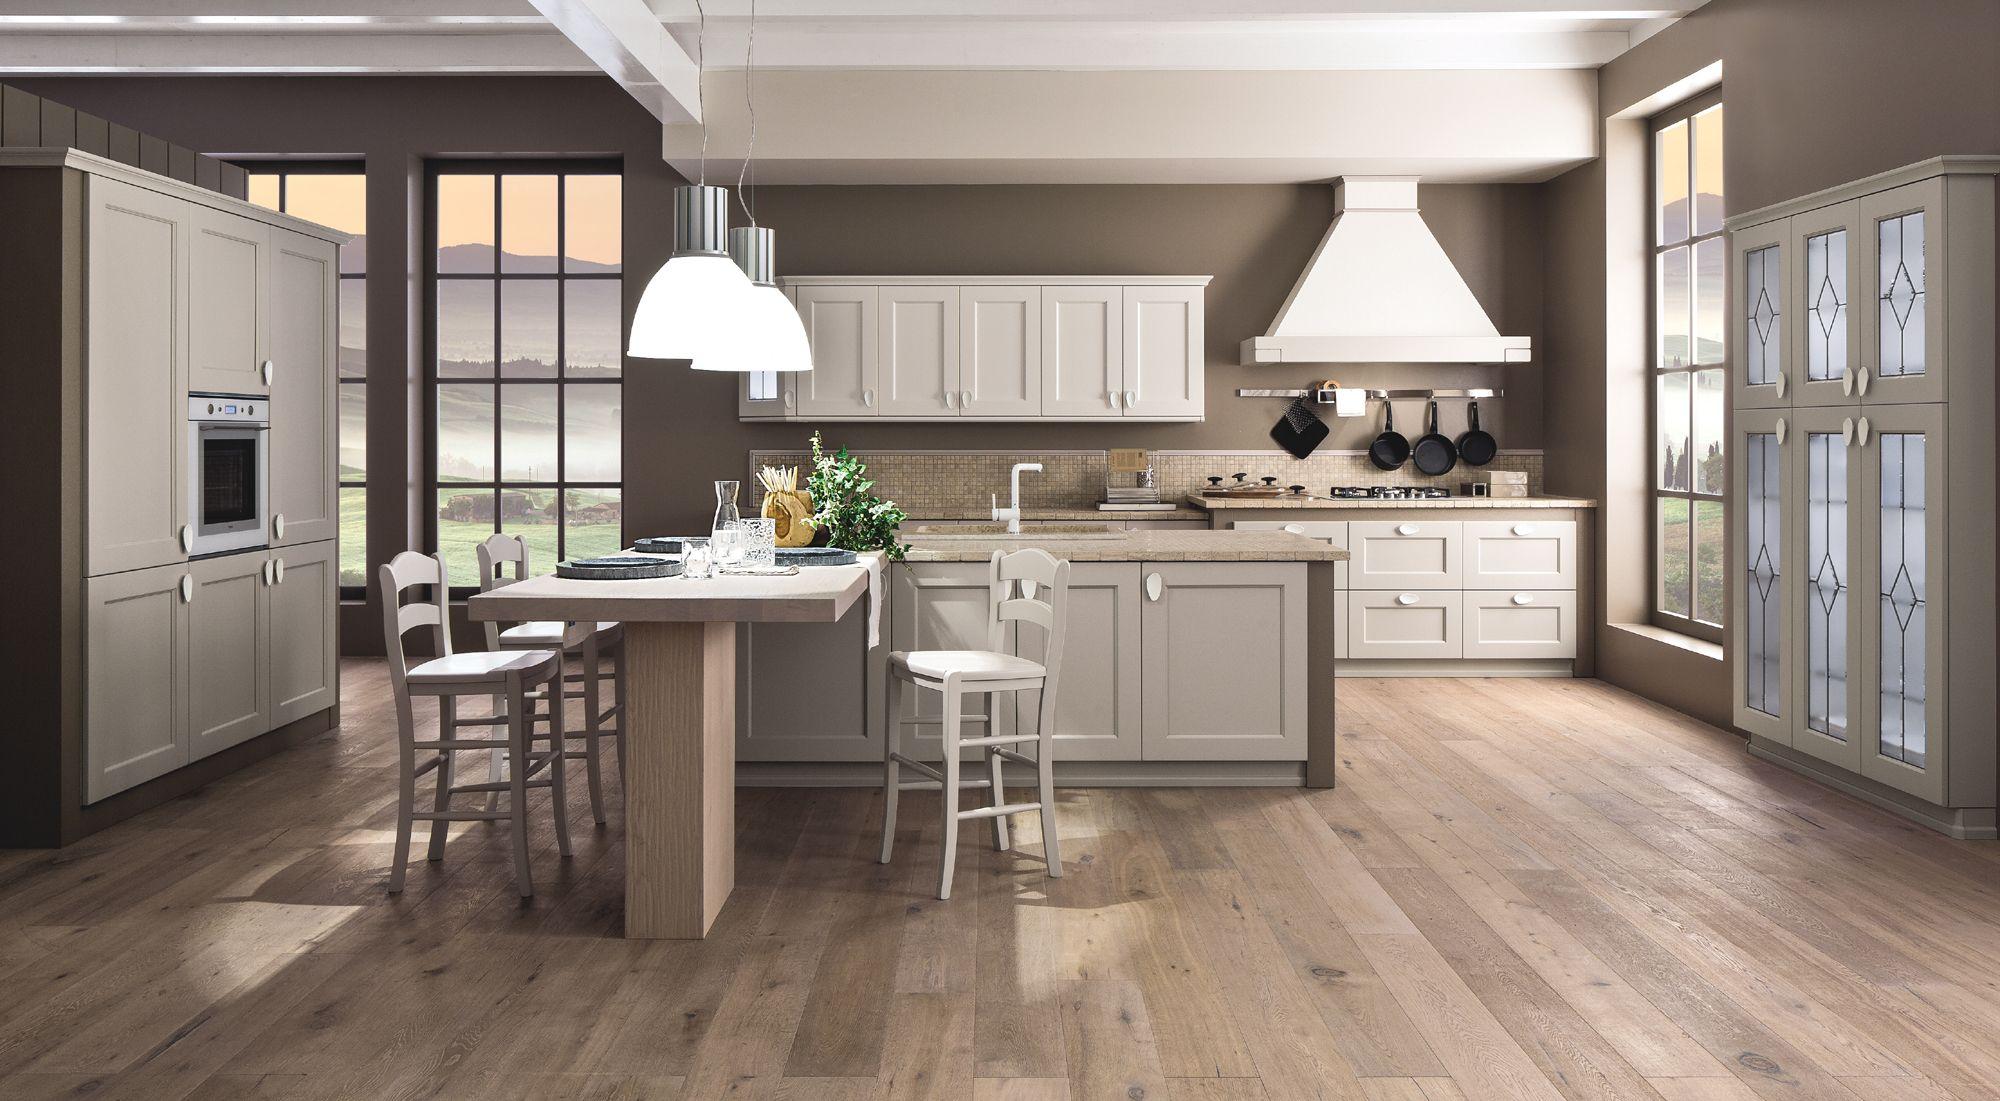 Cucina Arrex in stile classico dal design contemporaneo | cocina ...